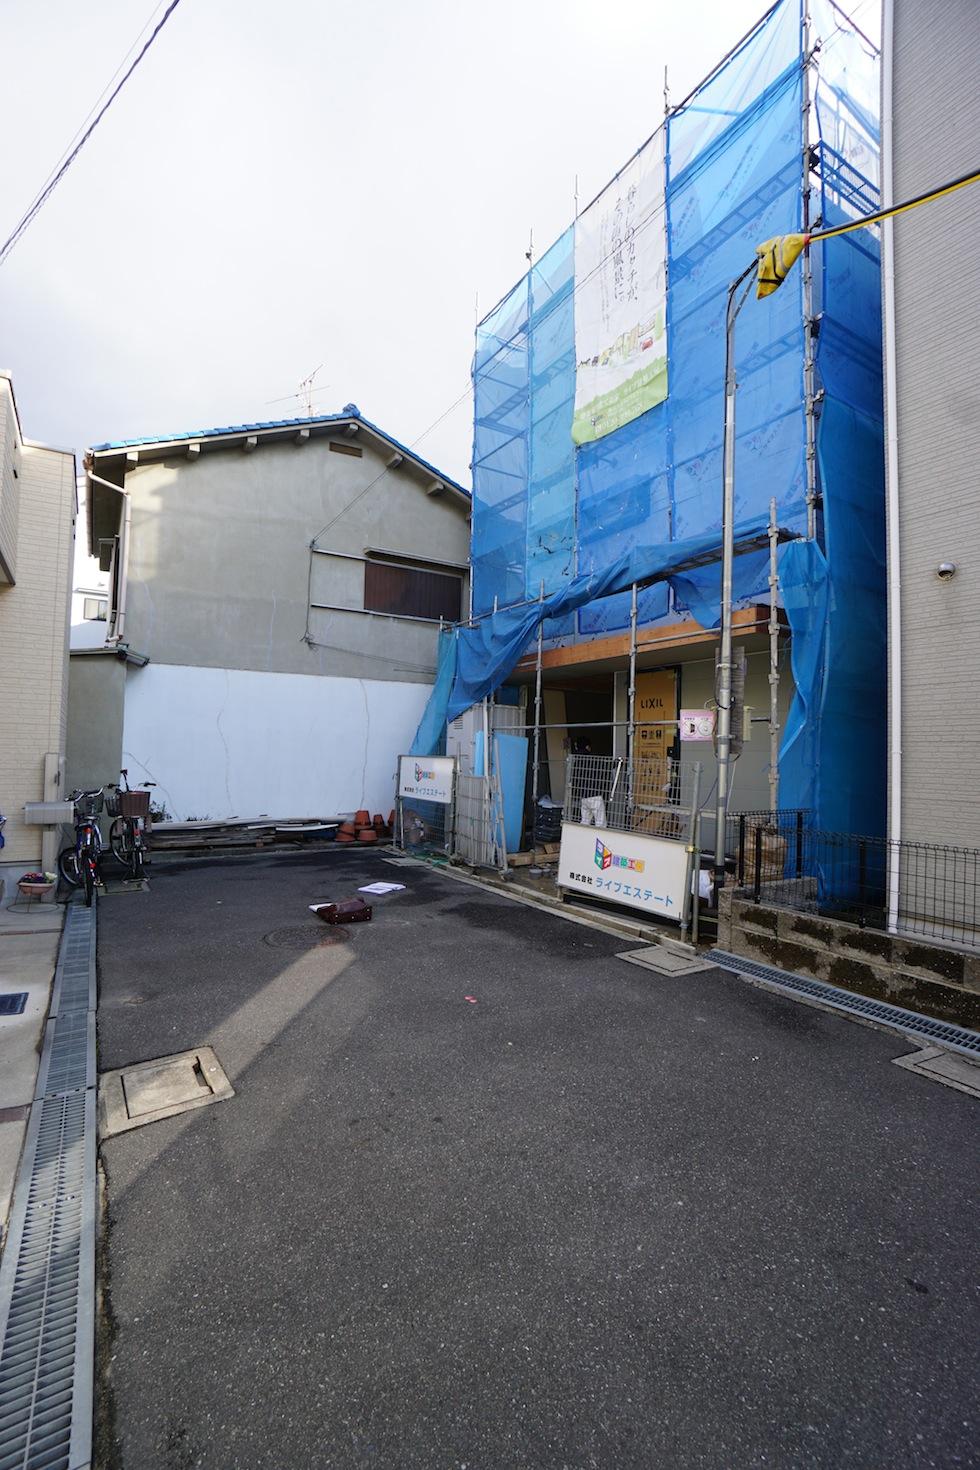 大阪,京都,神戸,高級注文住宅,木造3階建て,デザイン,外観